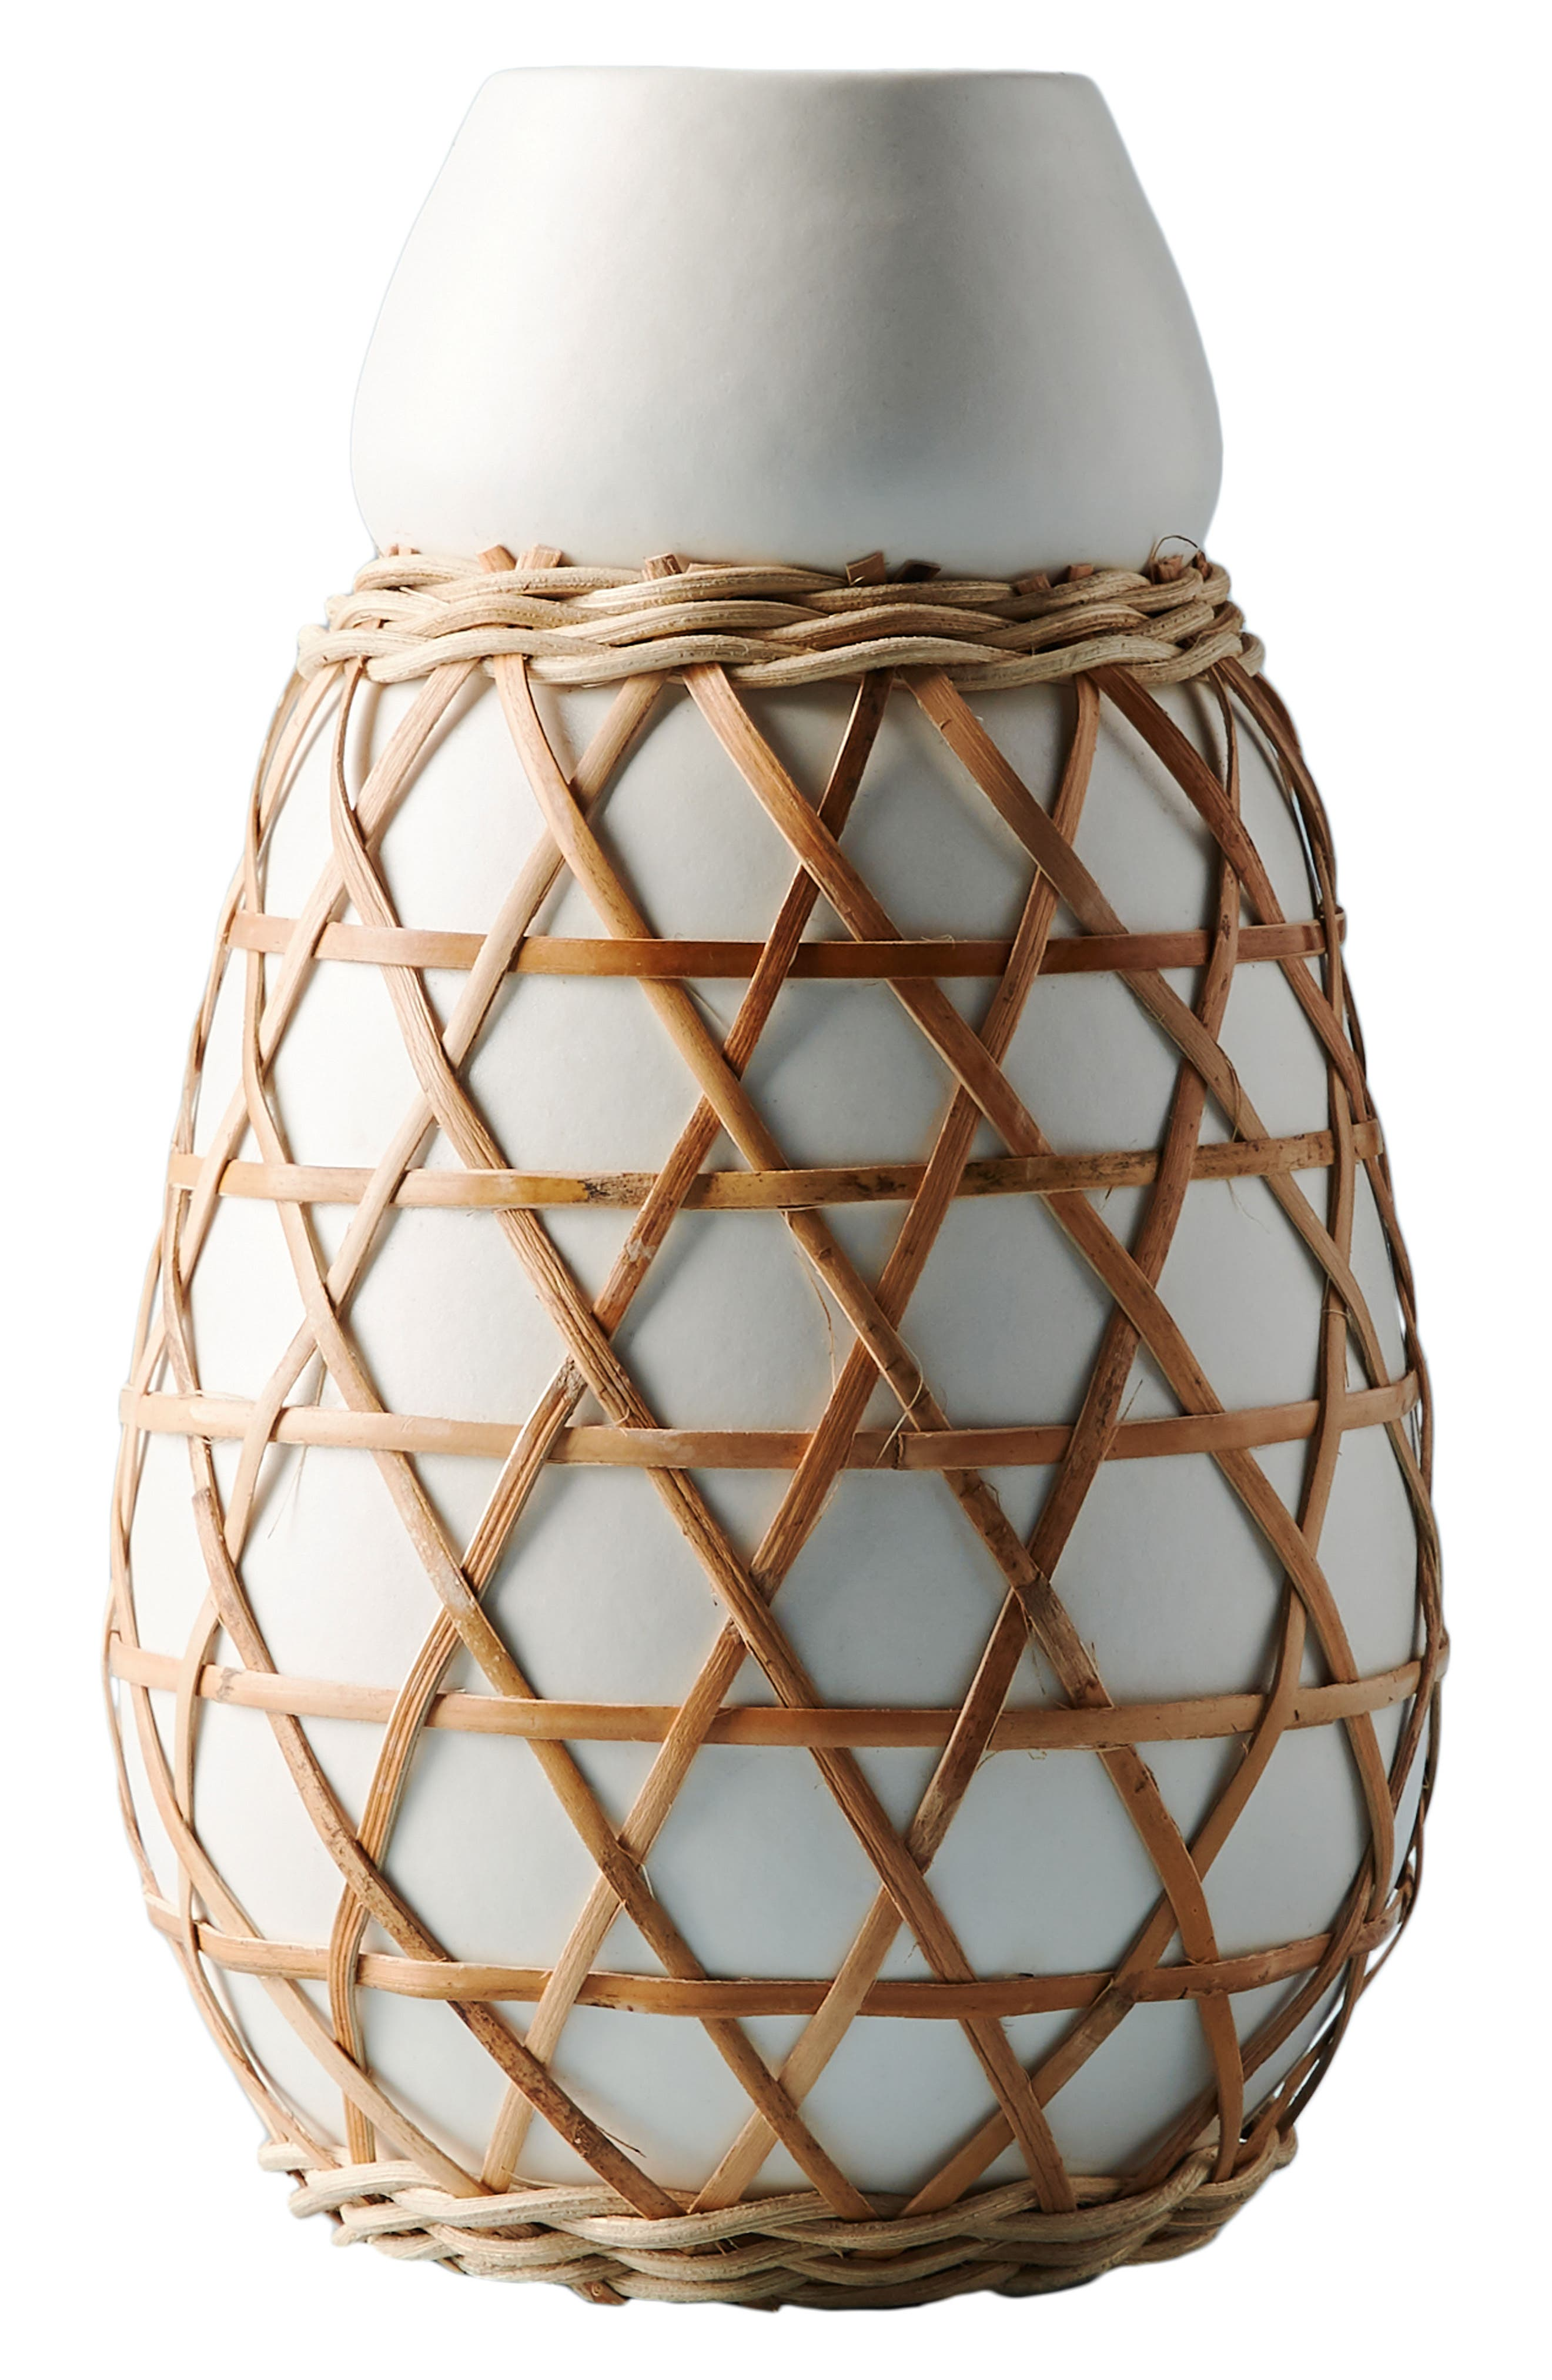 Woven Grass Vase,                             Alternate thumbnail 3, color,                             100